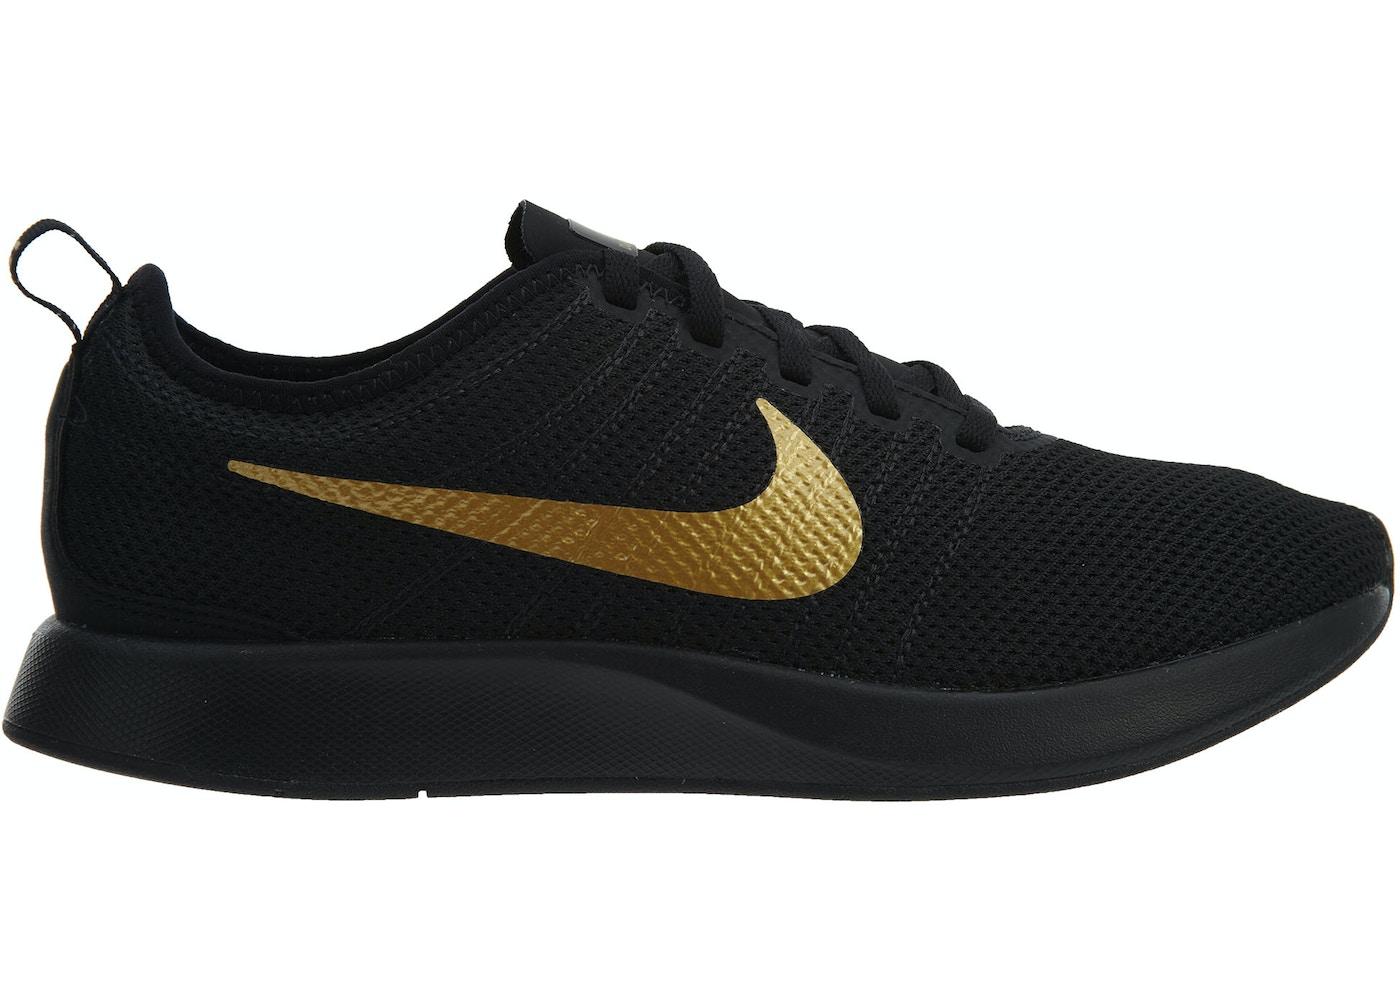 cheaper b3436 333bf Sell. or Ask. Size --. View All Bids. Nike Dualtone Racer Black Metallic  Gold